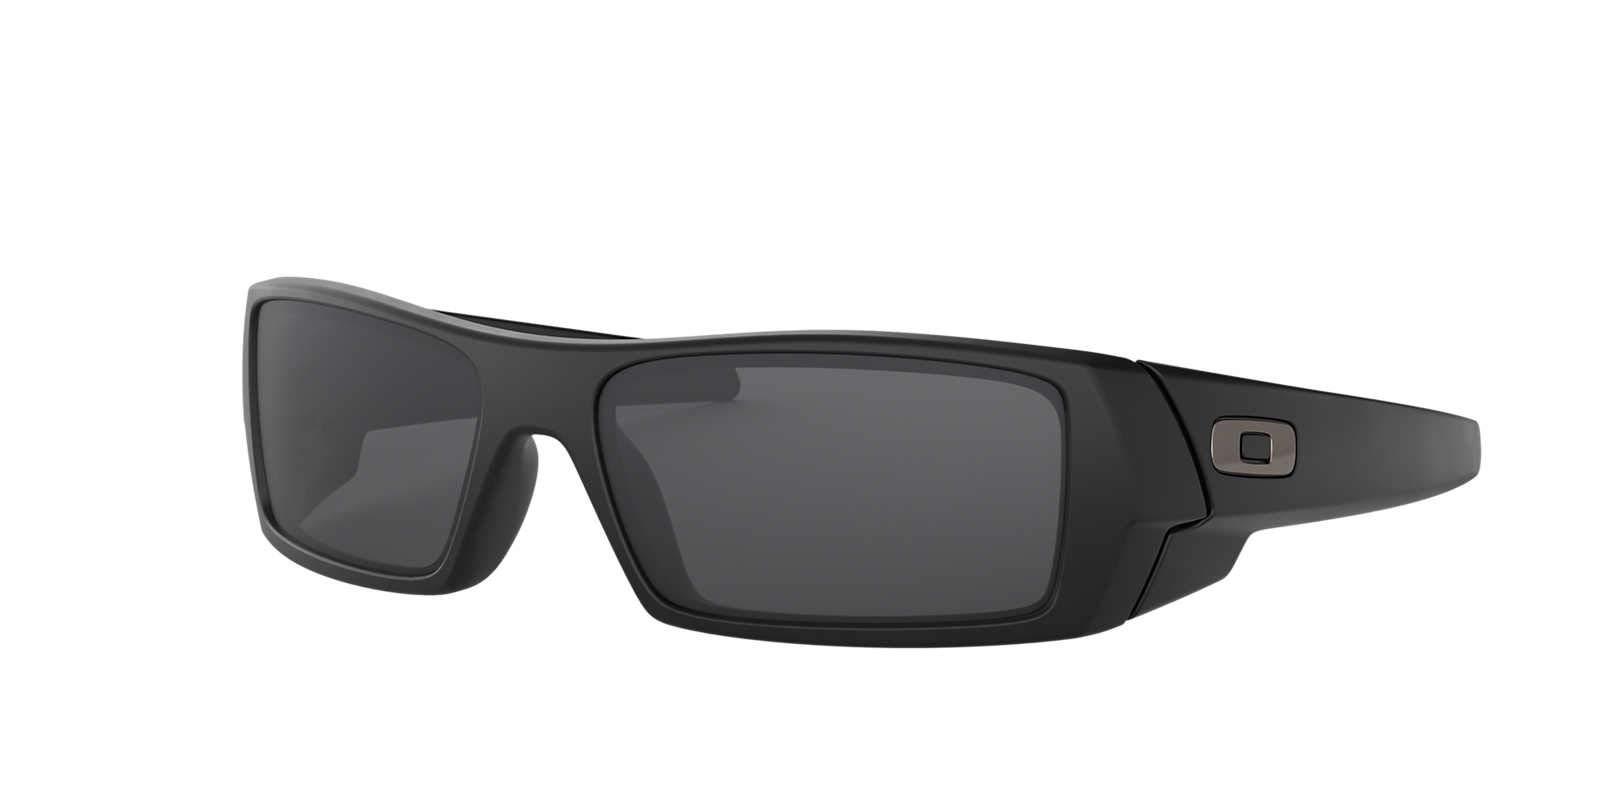 1b590198b4 Oakley Mens Gascan Sunglasses (OO9014) Black Matte Grey Plastic - Non- Polarized - 60mm